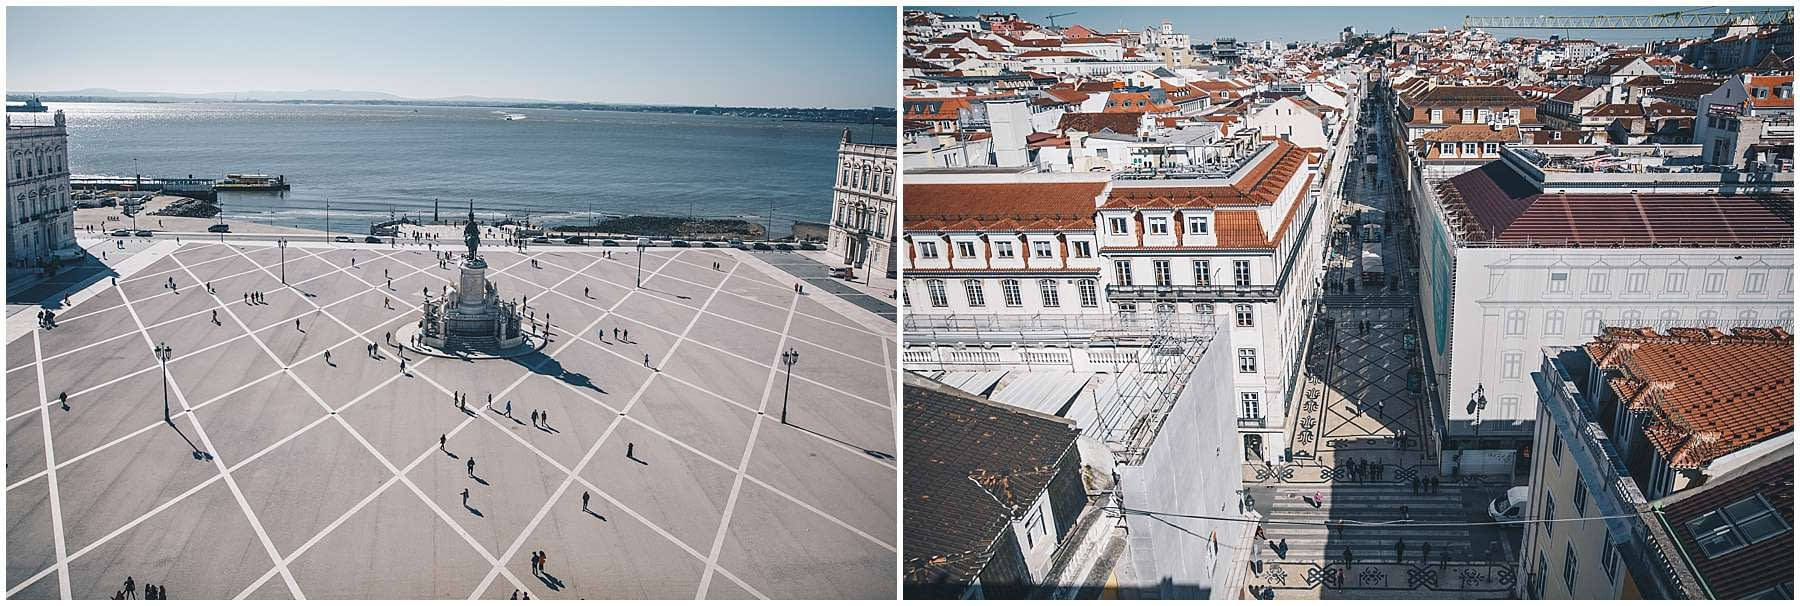 Portugal Lisbon_0010.jpg